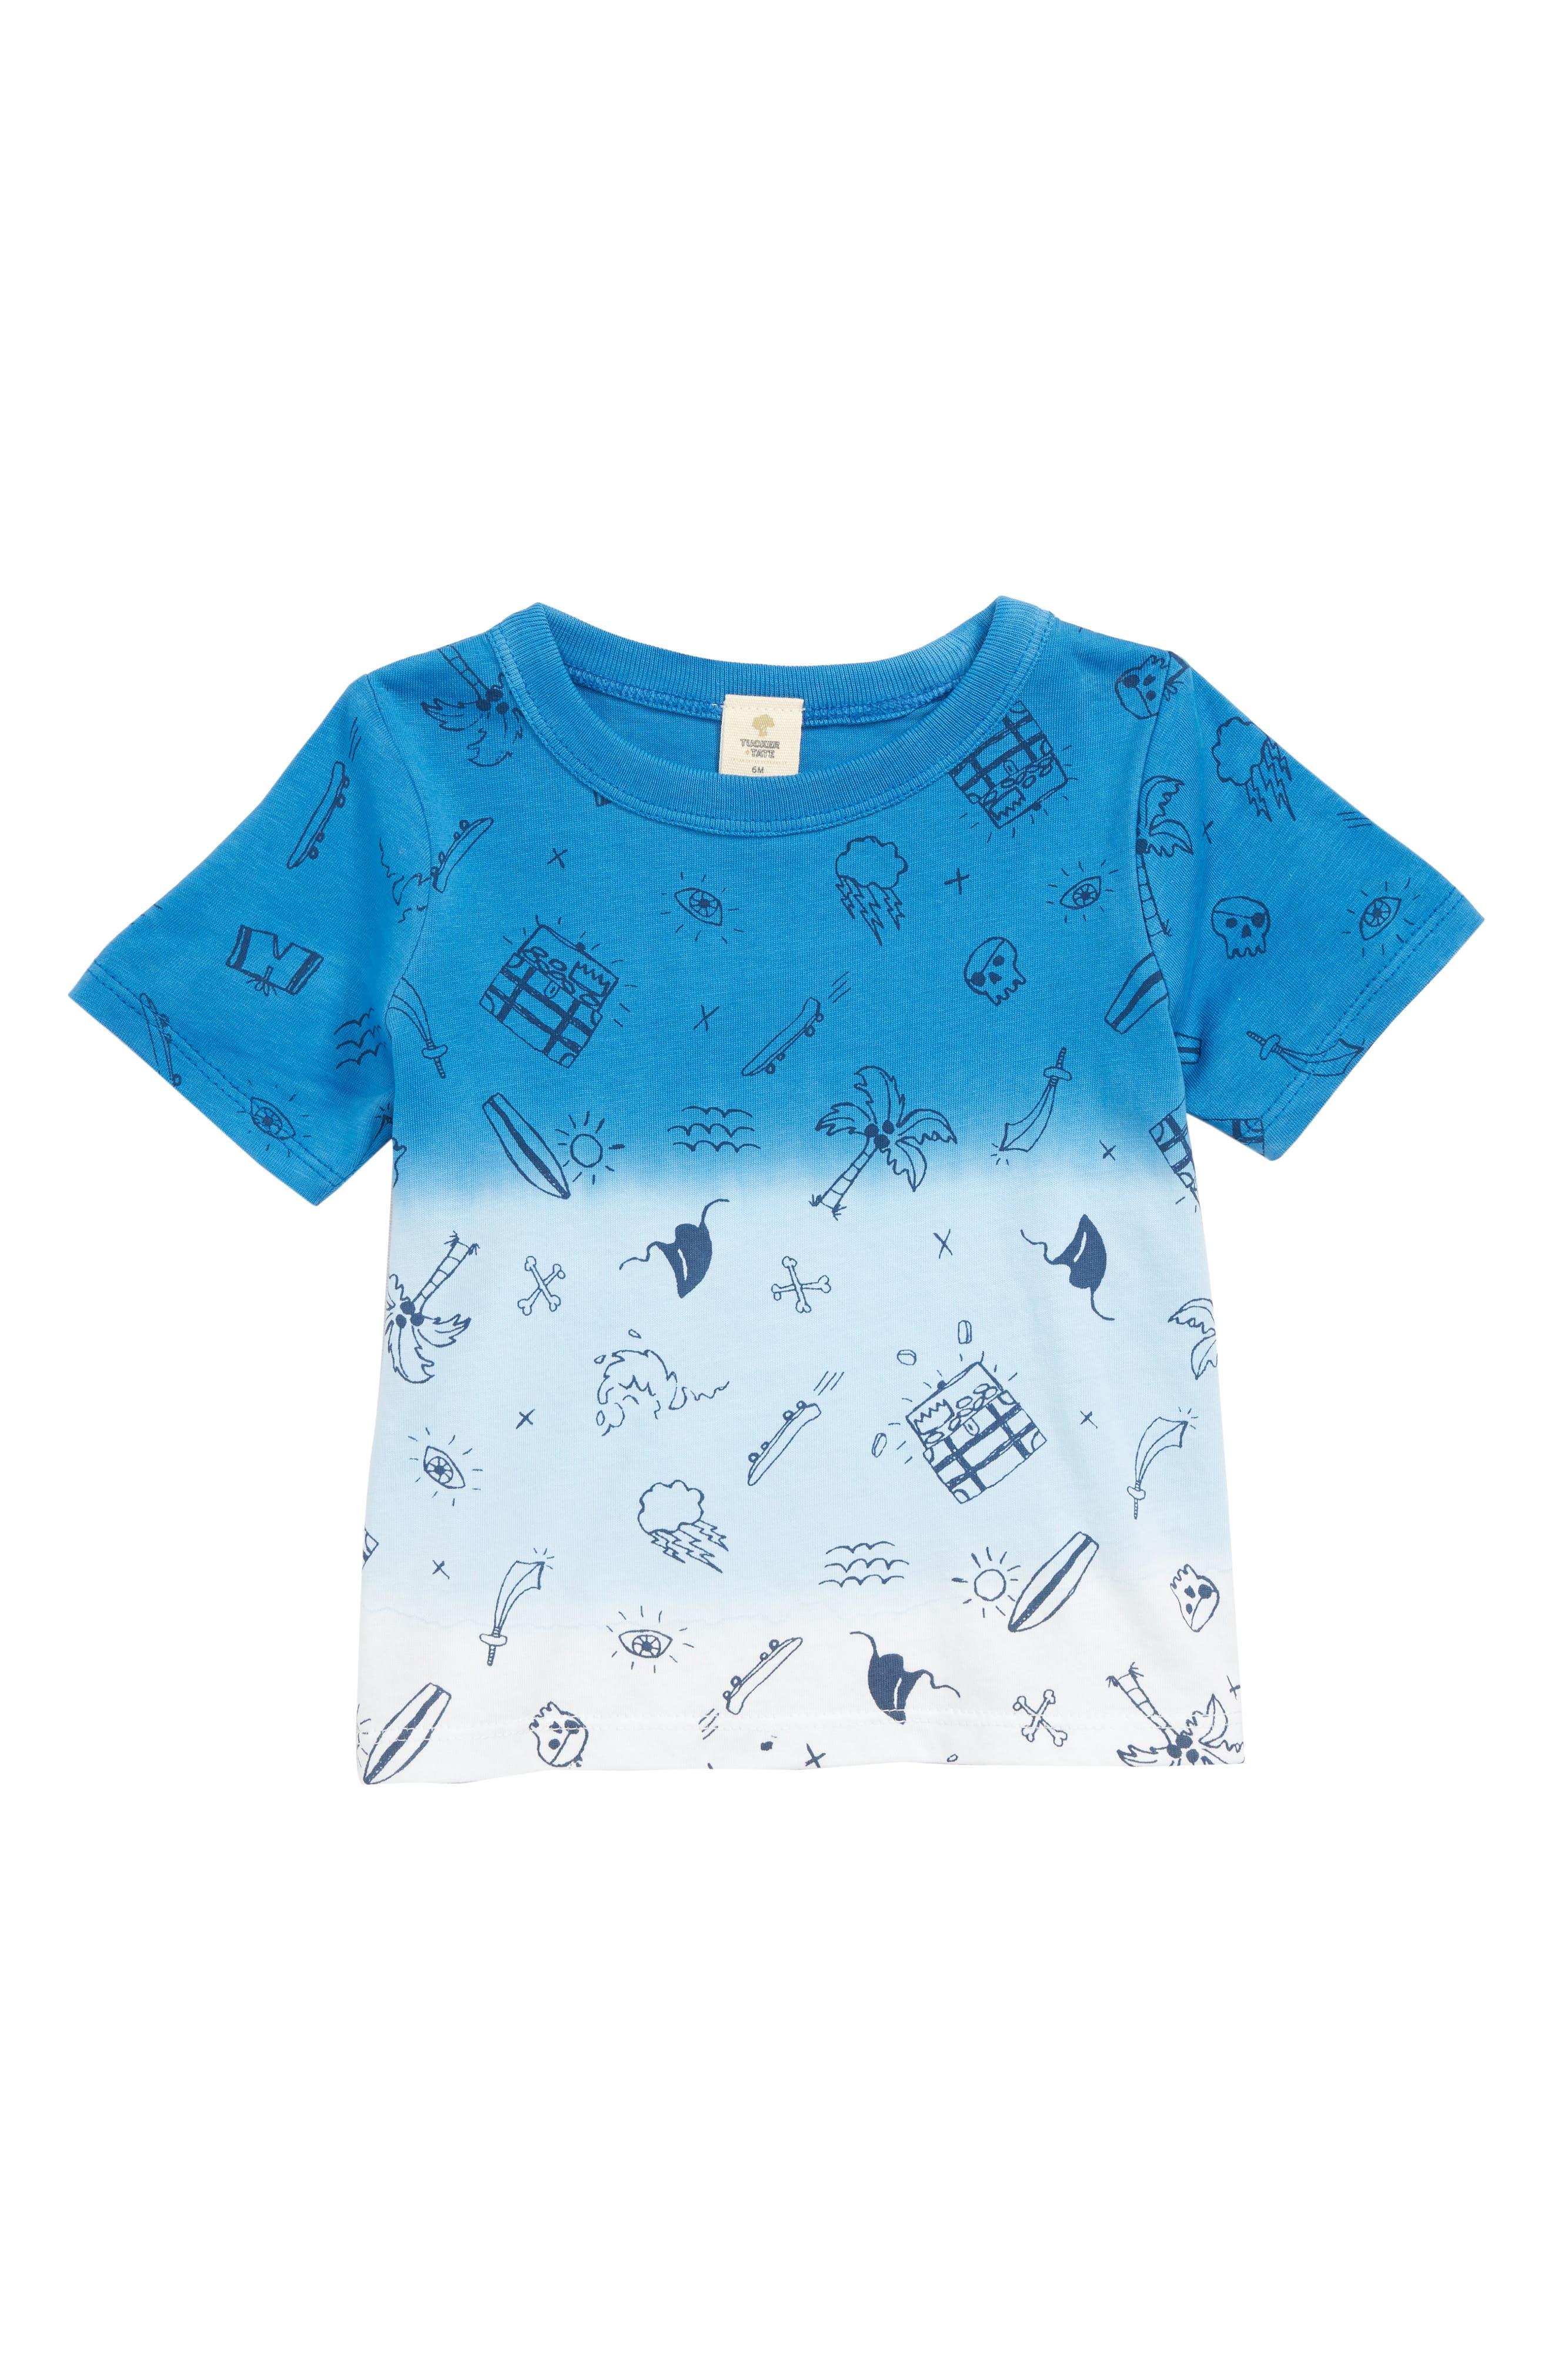 TUCKER + TATE,                             Ombré T-Shirt,                             Main thumbnail 1, color,                             401